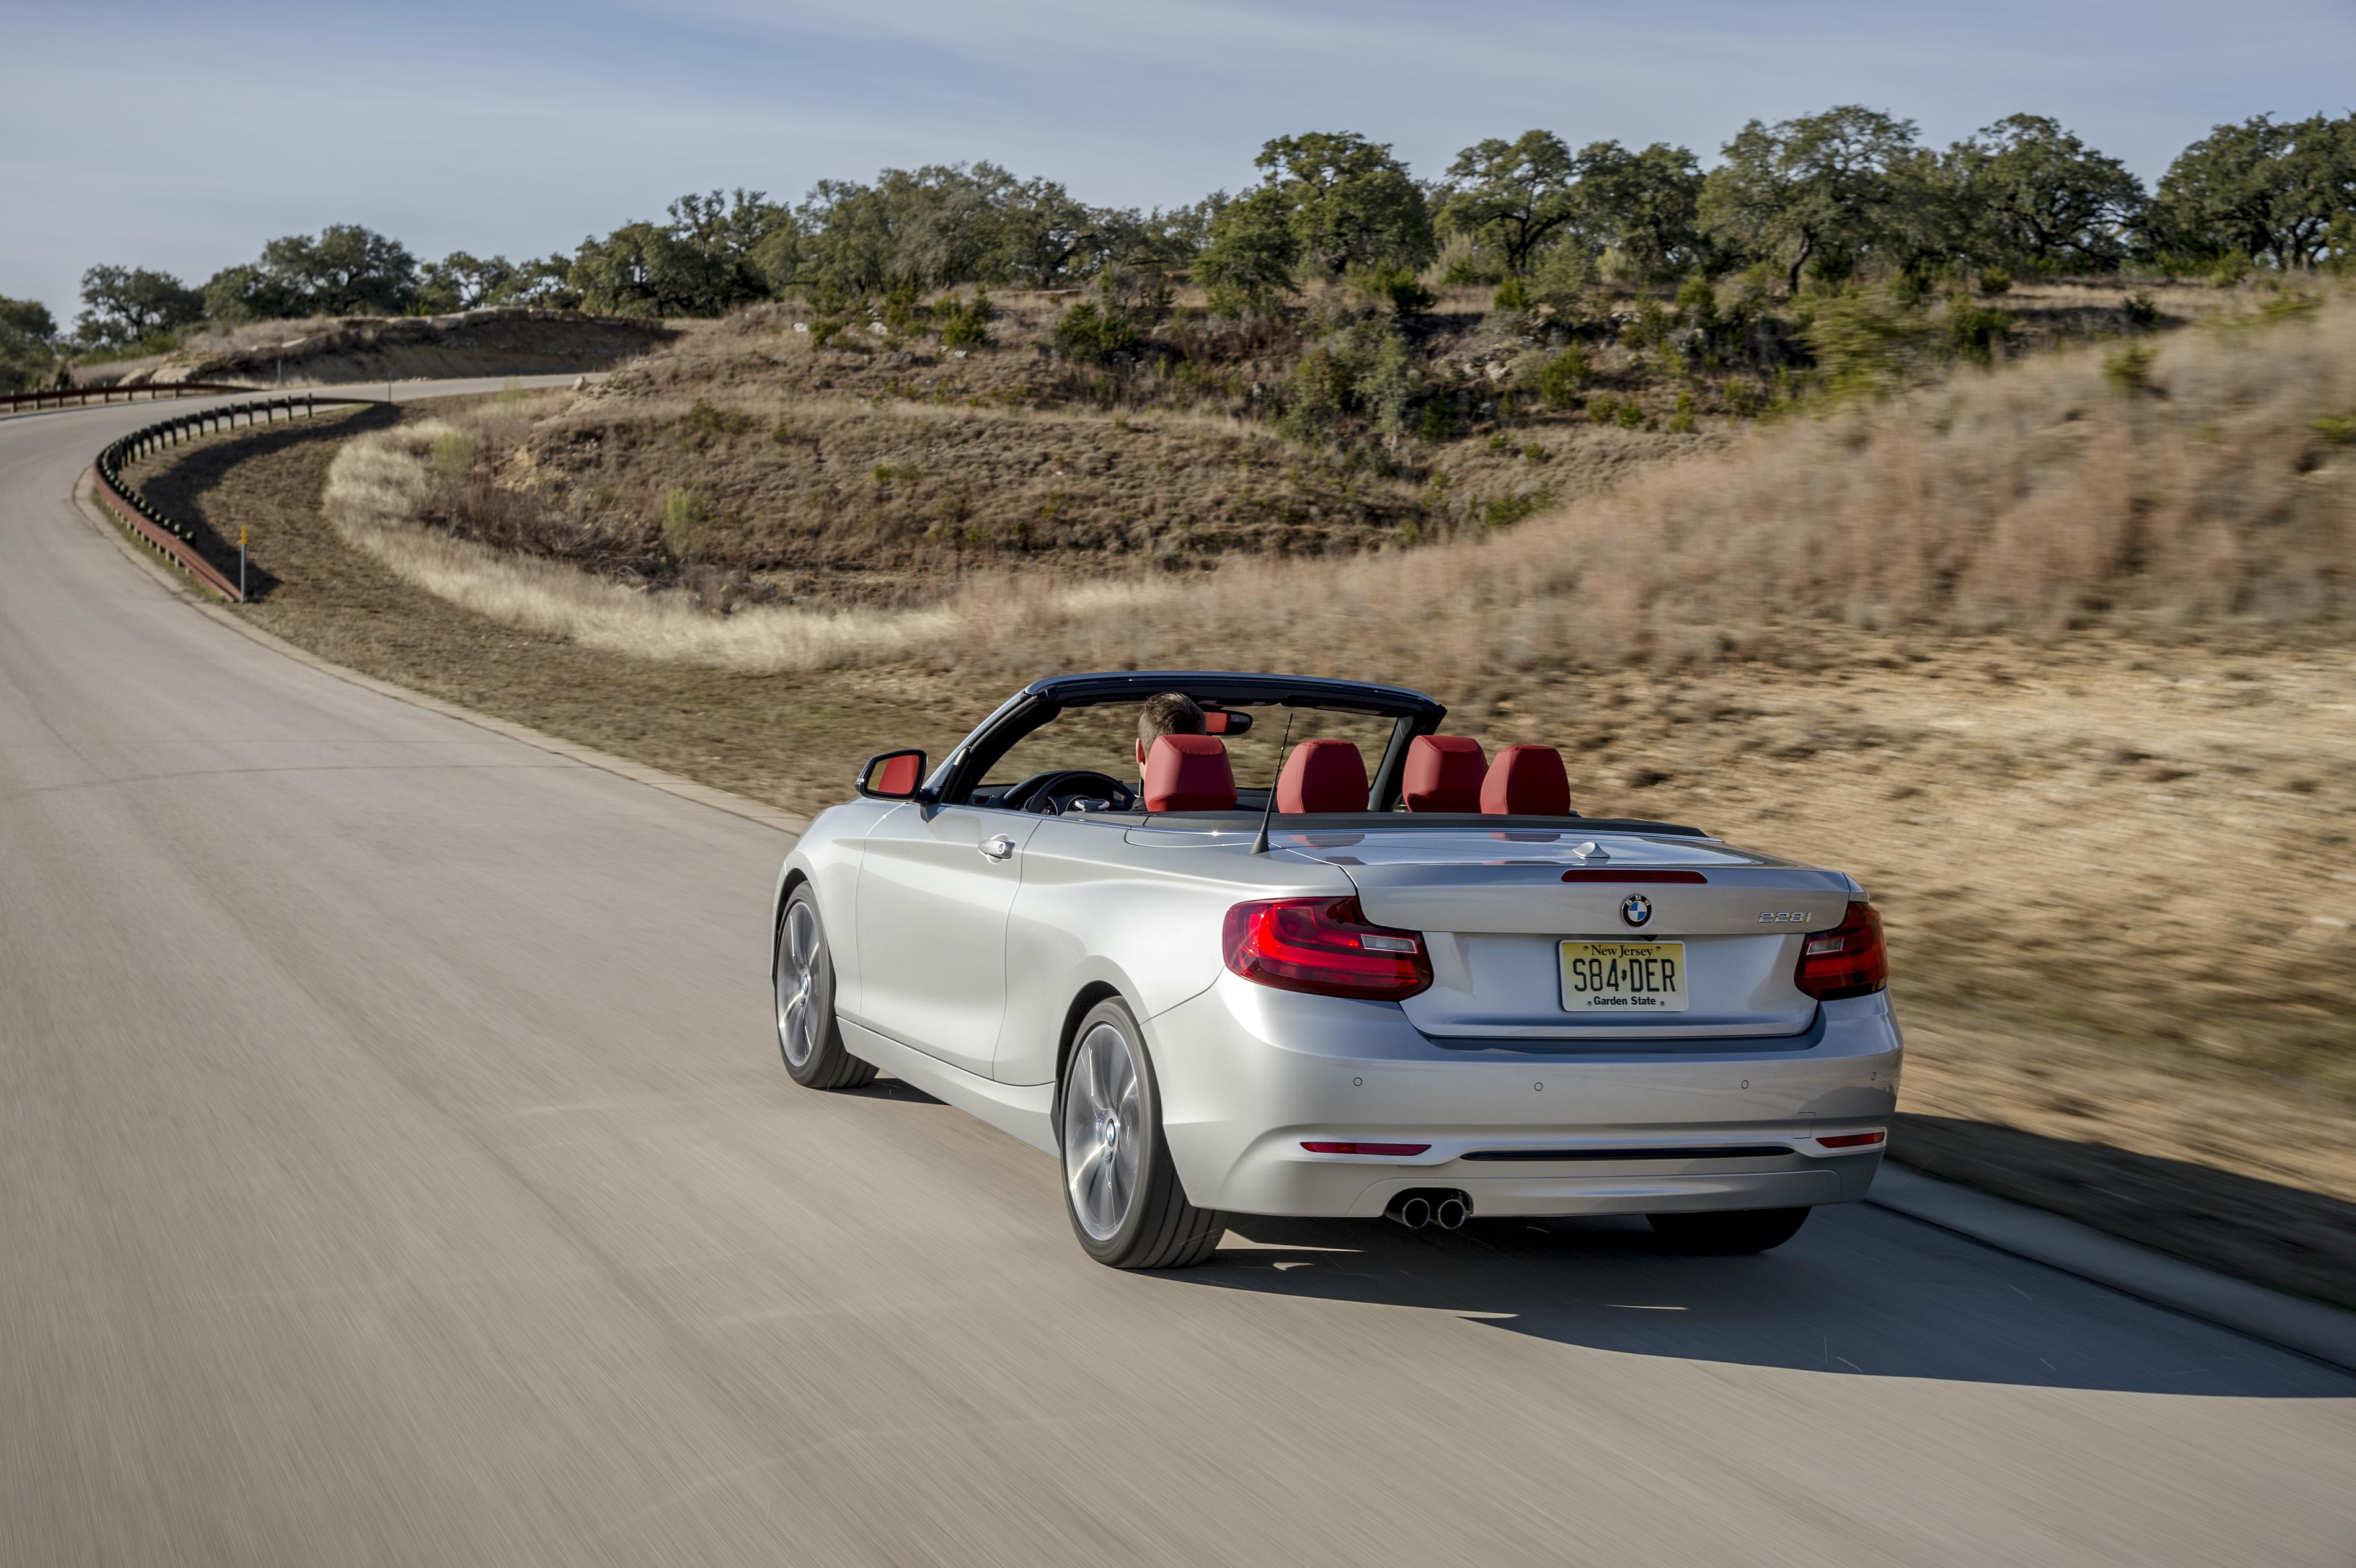 Wallpaper : BMW, Volkswagen, Sports Car, Convertible, Netcarshow, Netcar,  Car Images, Car Photo, 2016, 228i F23 Convertible, Wheel, Land Vehicle, ...